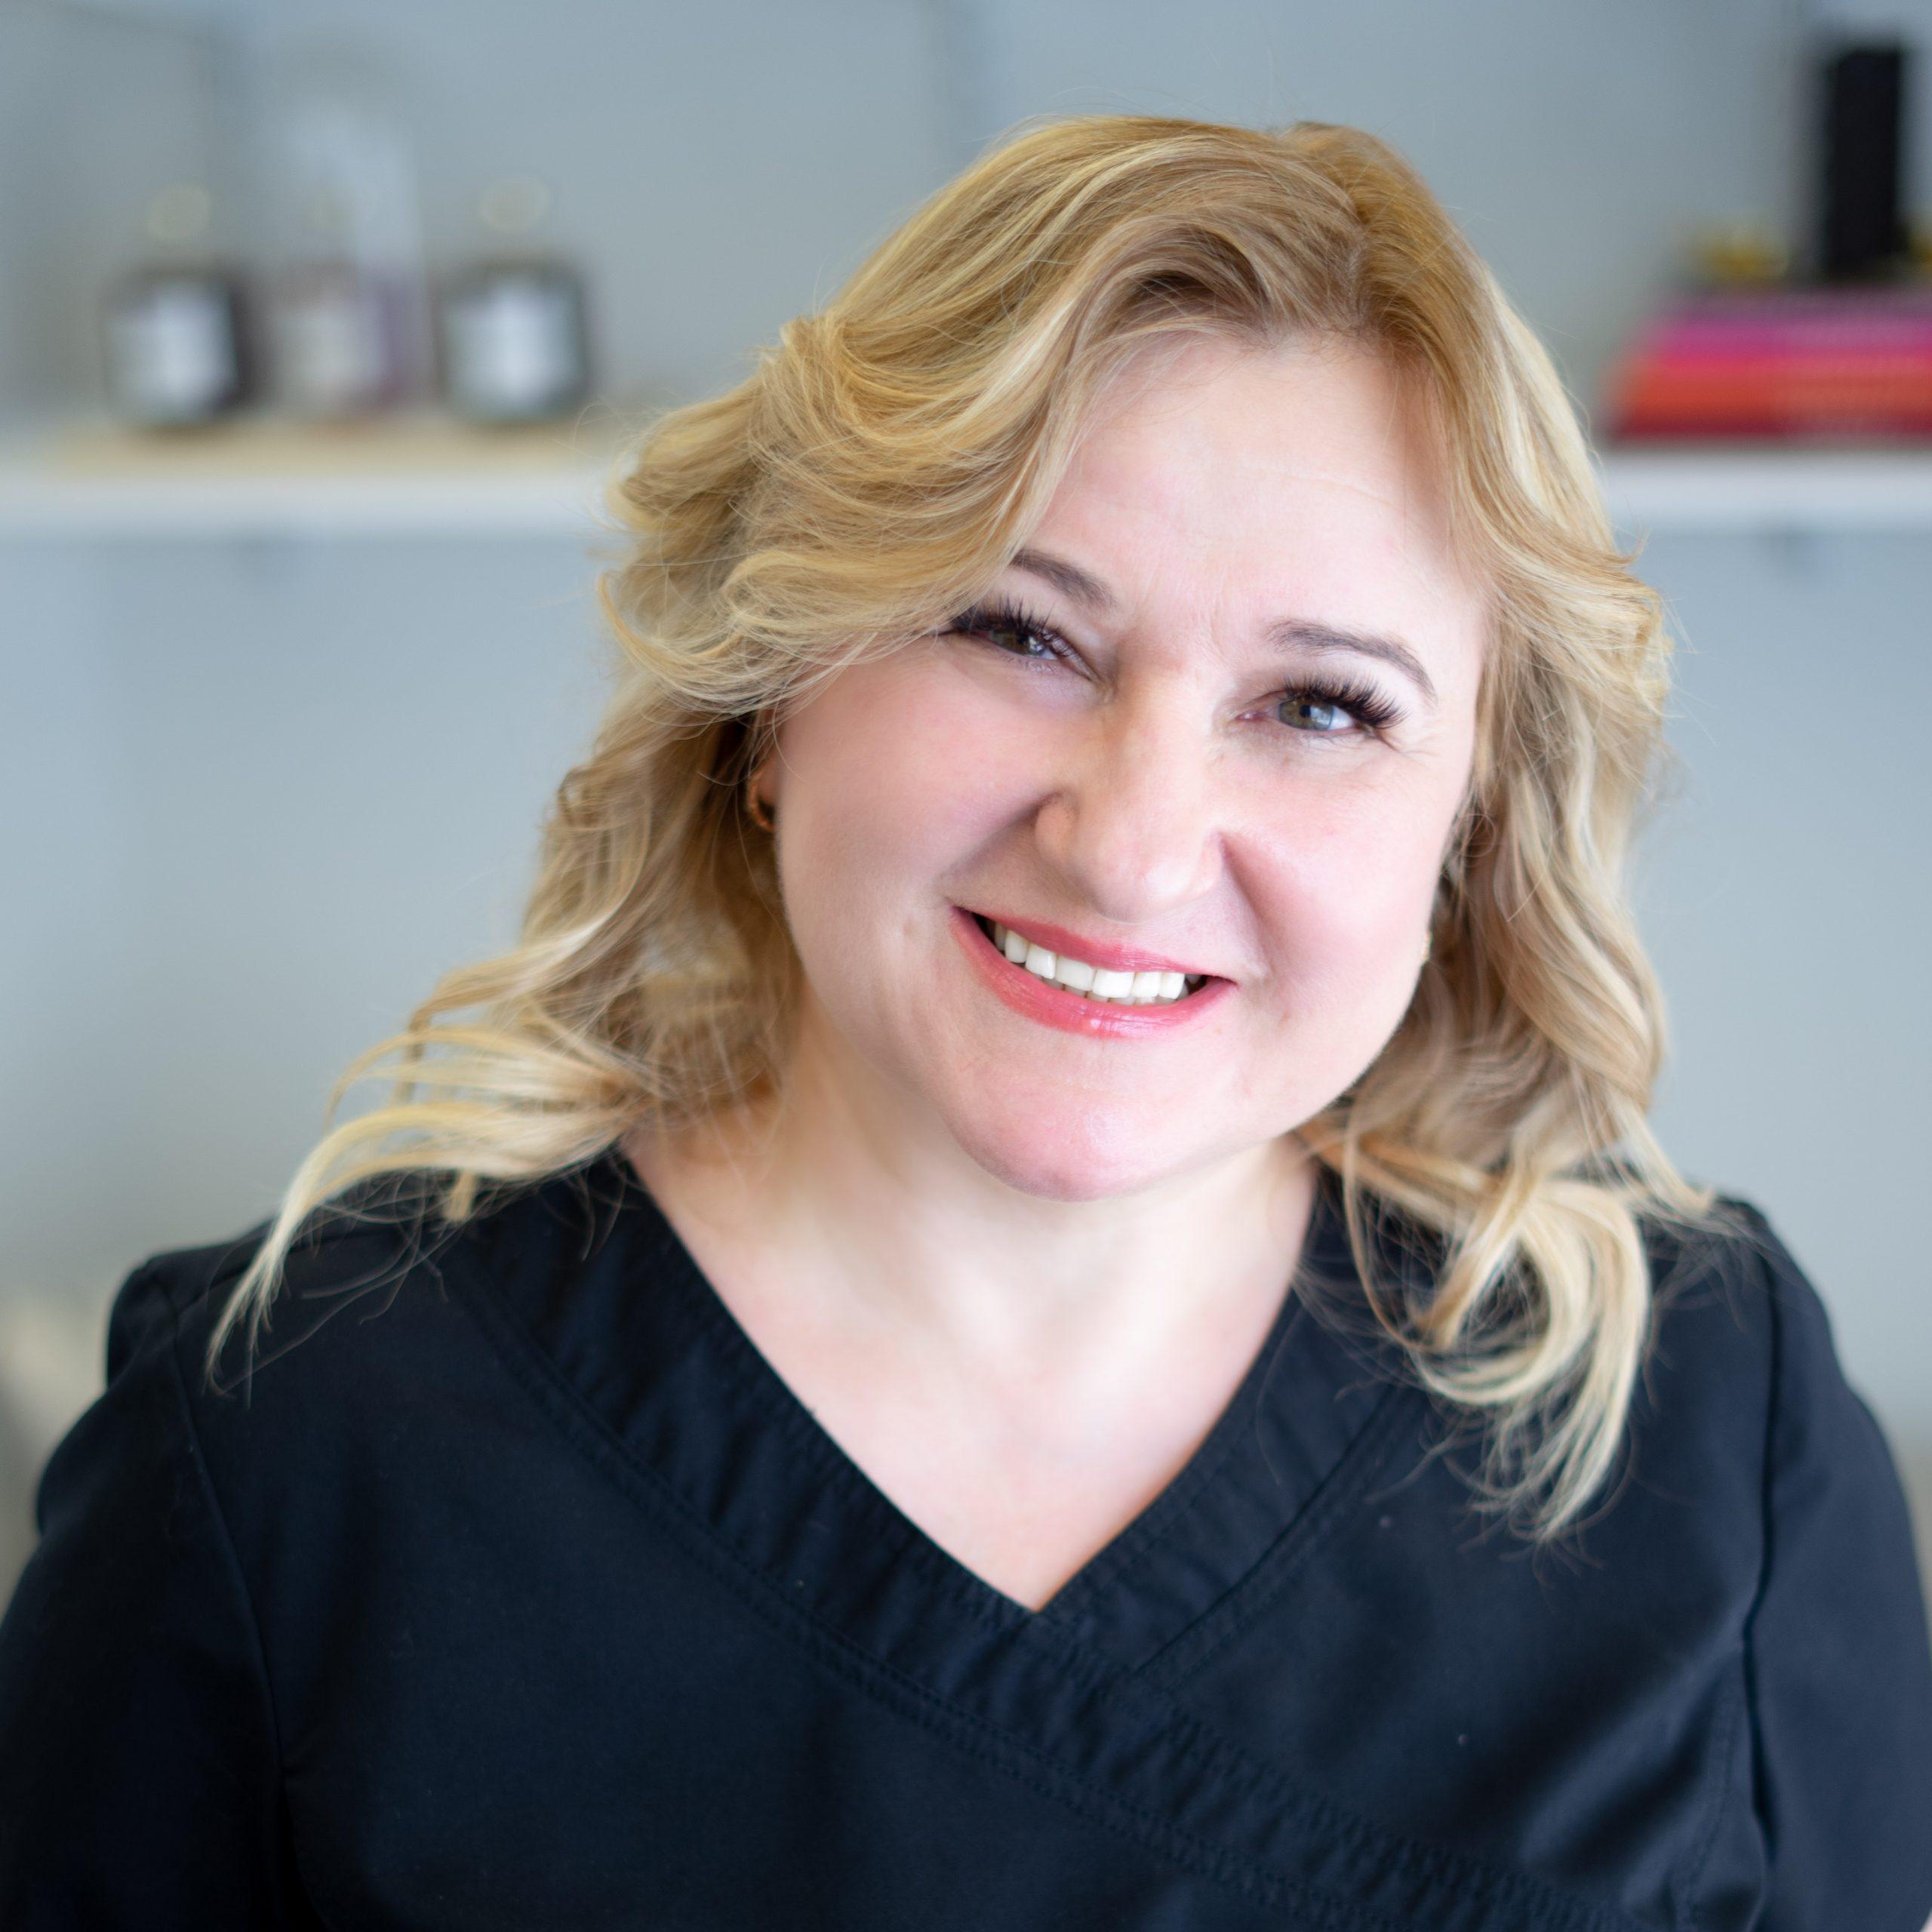 Viktoriya Moore